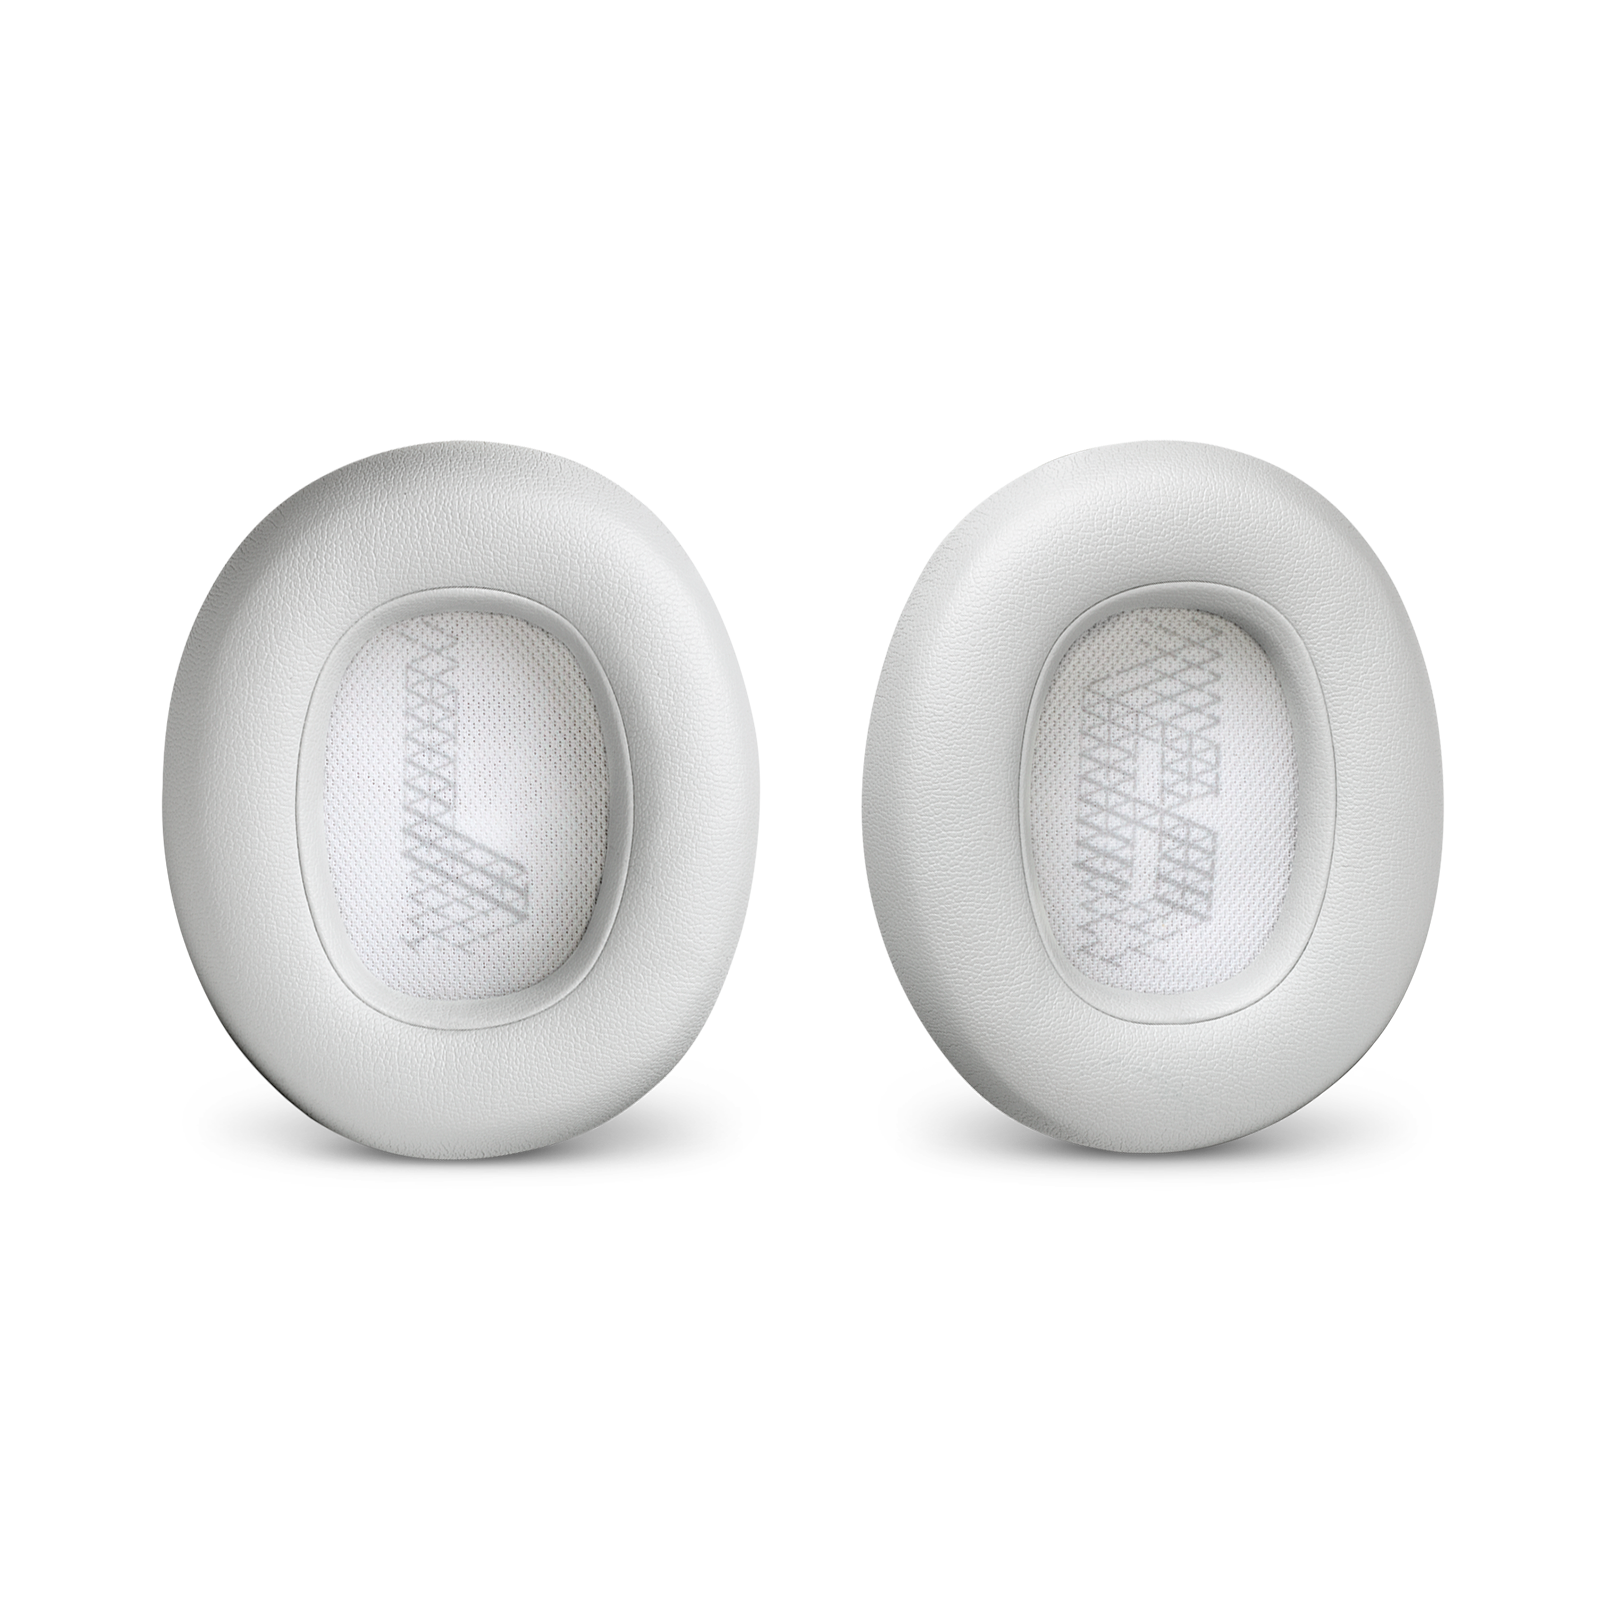 JBL Ear pads for Live 650 - White - Ear pads (L+R) - Hero